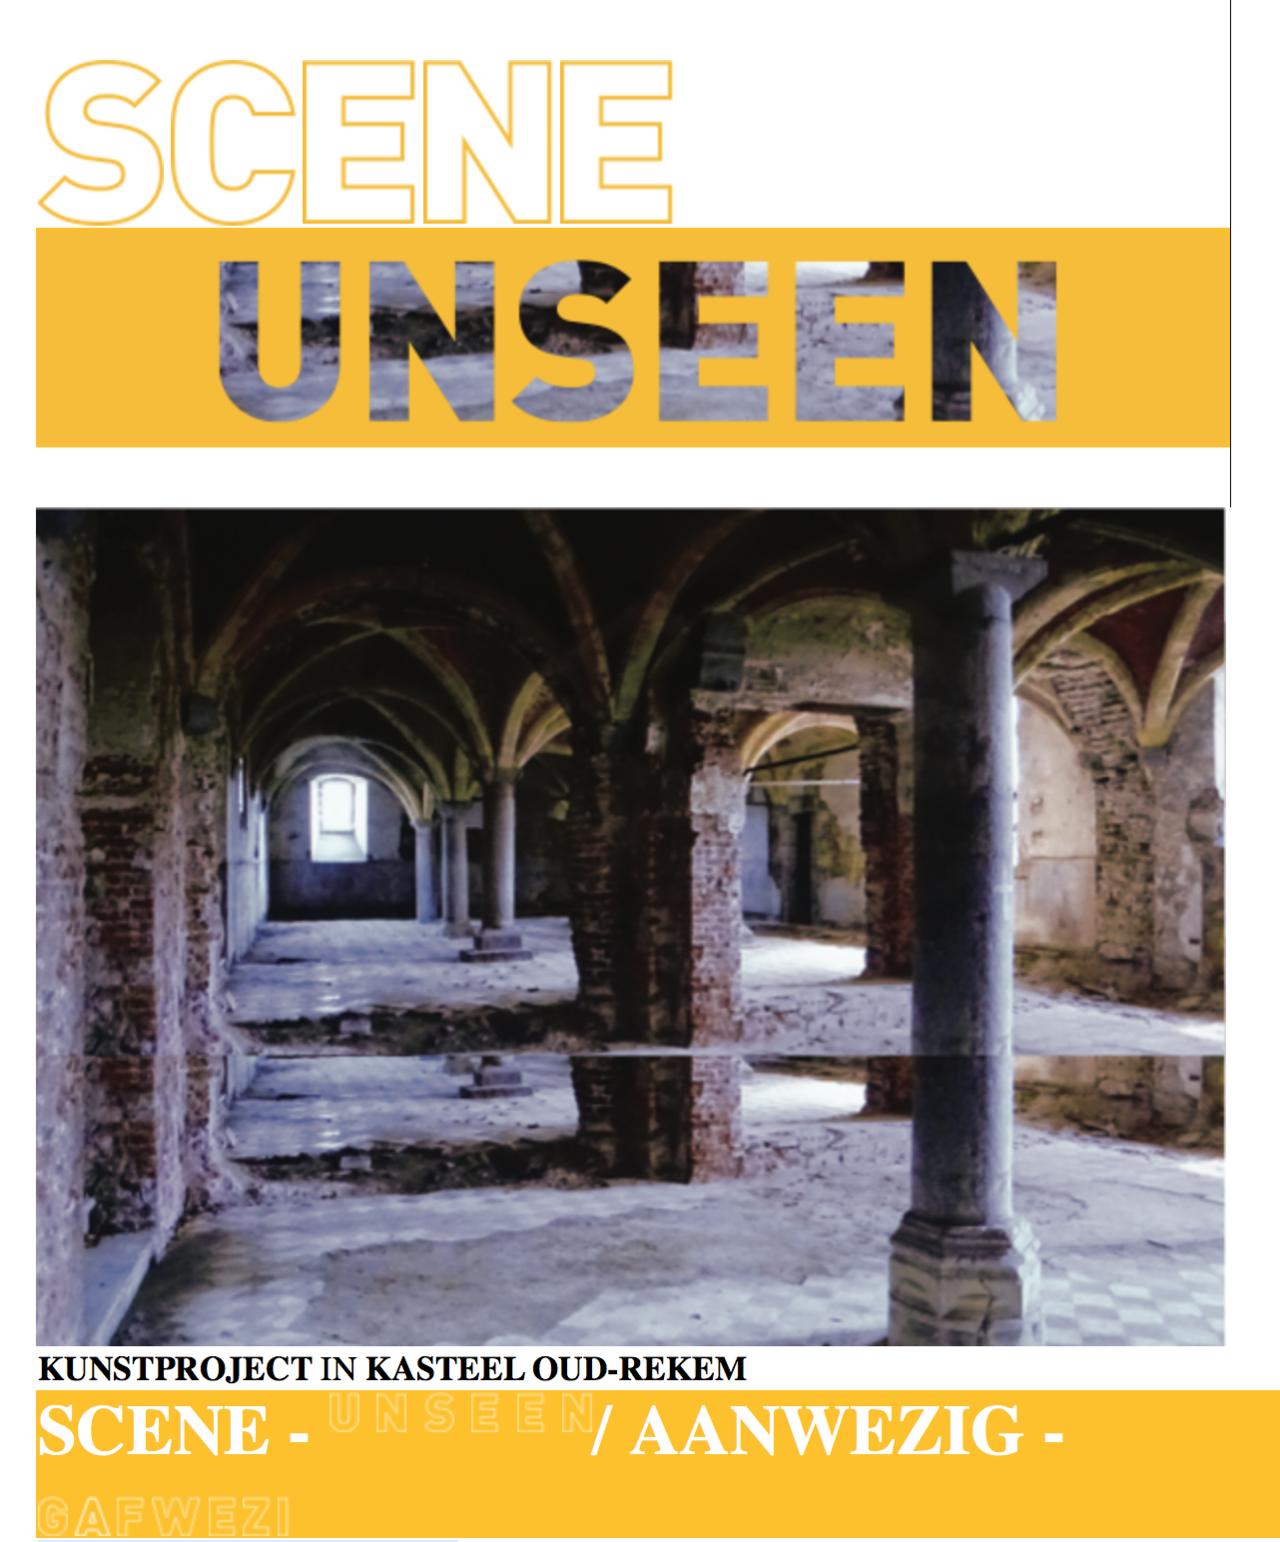 groupshow  SCENE/UNSEEN  atKasteel d'Aspremont-Lynden, Groenplaats 1 - 3621 Oud-Rekem, the Netherlands.  15 JULI - 30 SEPTEMBER 2018  with artists: Marina Abramovic (RS/NYC) | Joseph Maria Best (DE) | Guy Bleus (BE) | Sander Breure (NL) & Witte Van Hulzen (NL) | Imran Channa (PK) |cIndrikis Gelzis (LV) | Jef Geys (BE) Jos Jans (BE) | Kasper König (NL) Basir Mahmood (PK) | Keetje Mans (NL) | Marie-Jose Martens (BE) | Oleg Matrokhin (RU) | Marek Adam Olszynski (PL) | Hyesoo Park (KR) | Charlotte Schleiffert (NL) | Stefan Seelge (DE) | Jessica Segall (NY) Toon Tersas (BE) | Bob Thissen (NL) & Toon Loenders (BE) | Greet Van Autgaerden (BE) | Chaim Van Luit (NL) Sharon Van Overmeiren (BE) | Wim Wauman (BE) | Guido Yannitto (AR)  Interactiemetkunstenaars 'DEAPPEL' en 'AGORA' 1975-1985:  Marina Abramovic/Ulay | Bend'Armagnac | Barbara Bloom Gerrit Dekker | Herve Fischer | Hetty Huisman | Servie Janssen | Sef Peeters | Lydia Schouten  Curatoren: Annemie Van Laethem | Erik Croux | Mat Verberkt. (ForumTriangulare)